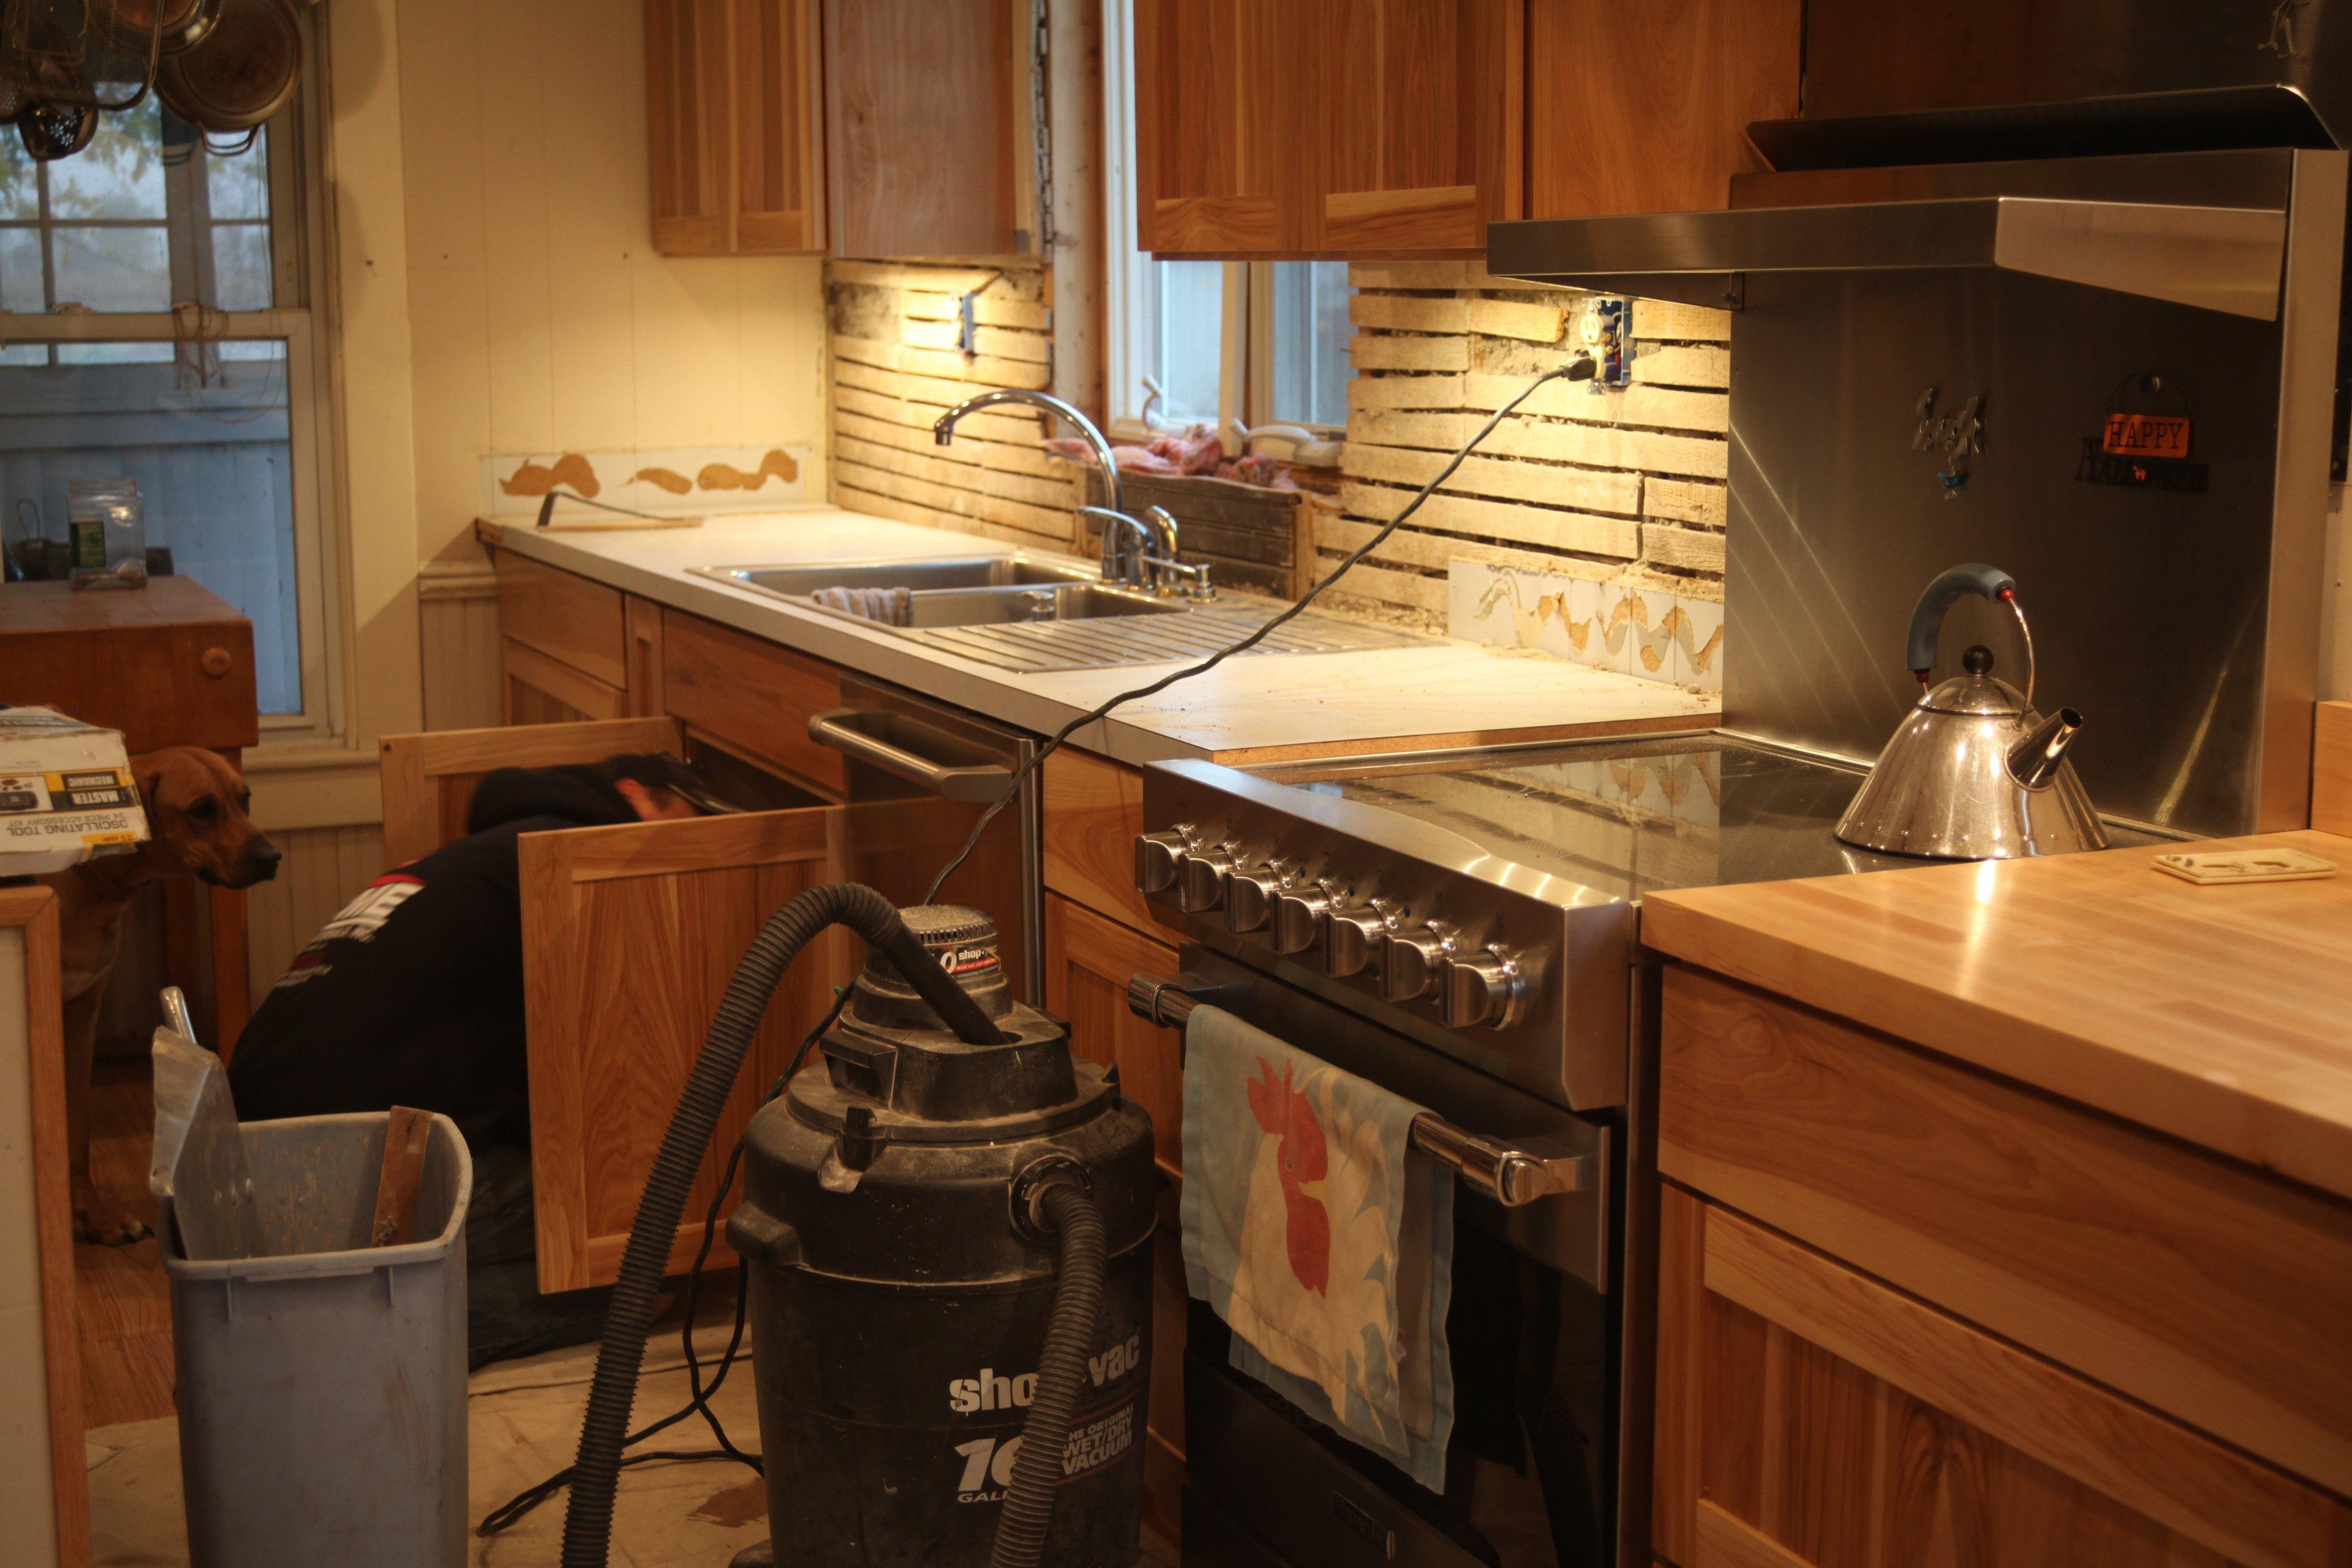 the work of kitchen #2